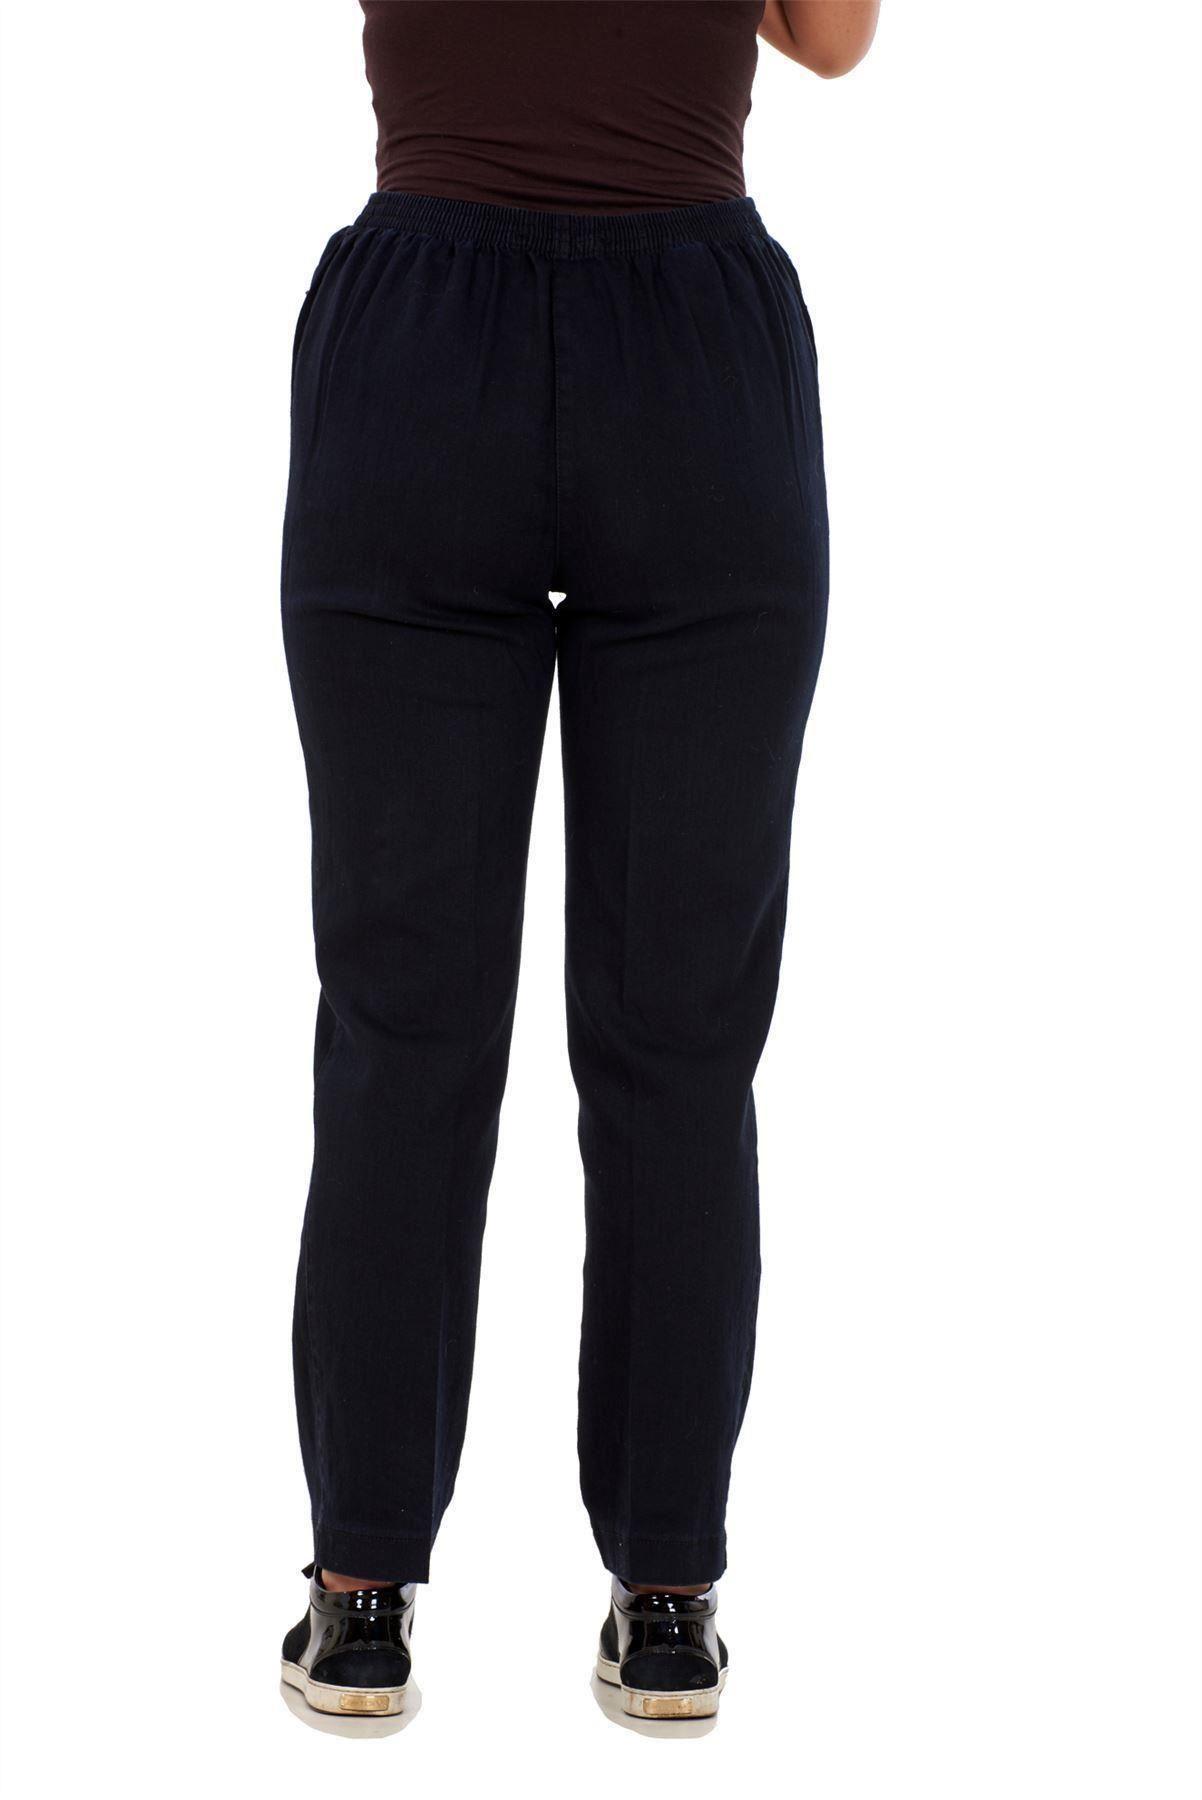 Ladies-Women-Trousers-Rayon-Cotton-Pockets-Elasticated-Stretch-Black-pants-8-24 thumbnail 6